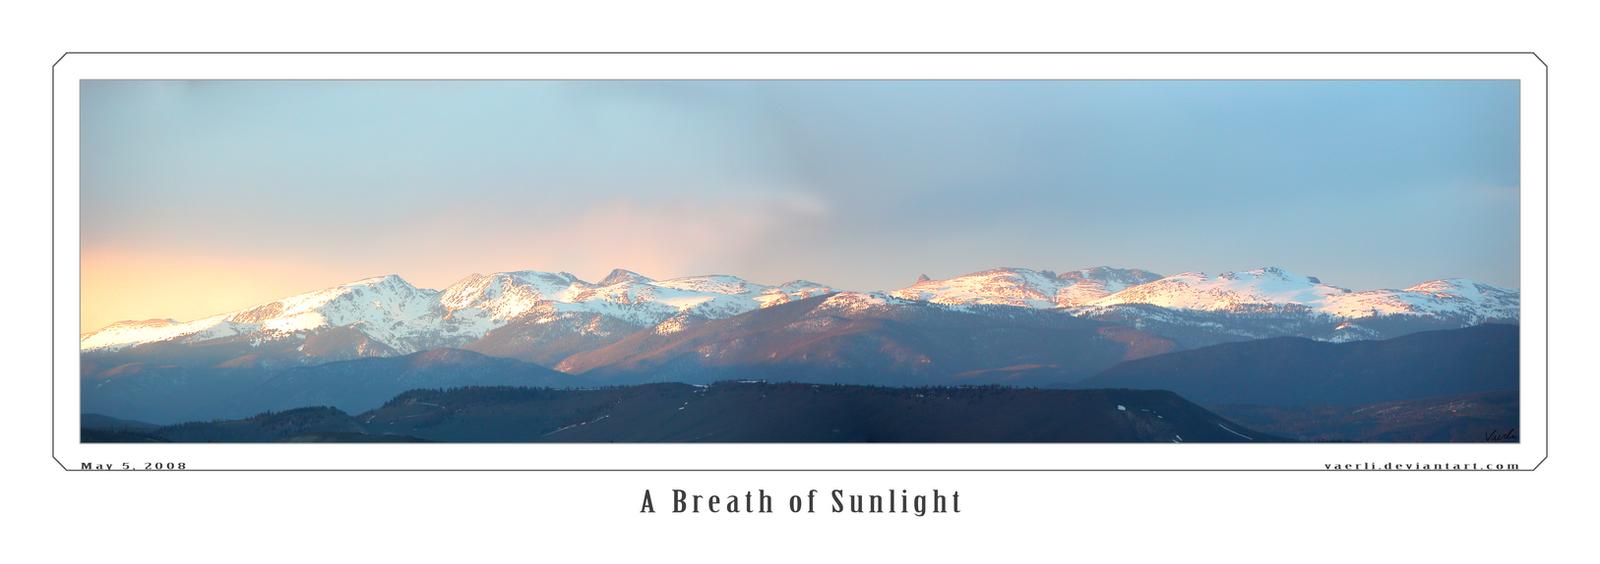 A Breath of Sunlight by Vaerli